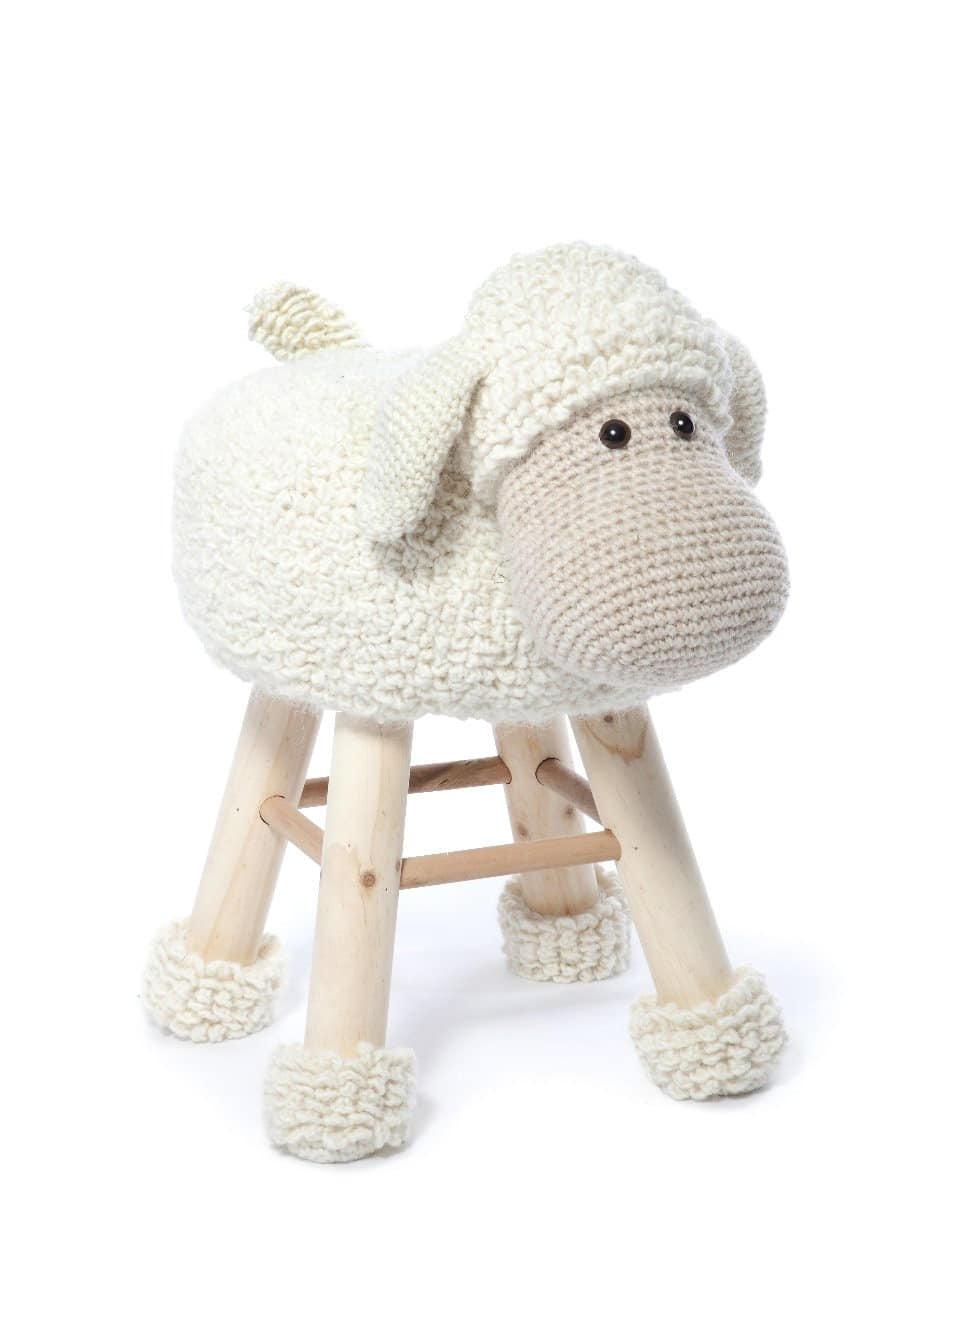 Buy Animal Stool Crochet Part 1 Anja Toone 183 Afterpay